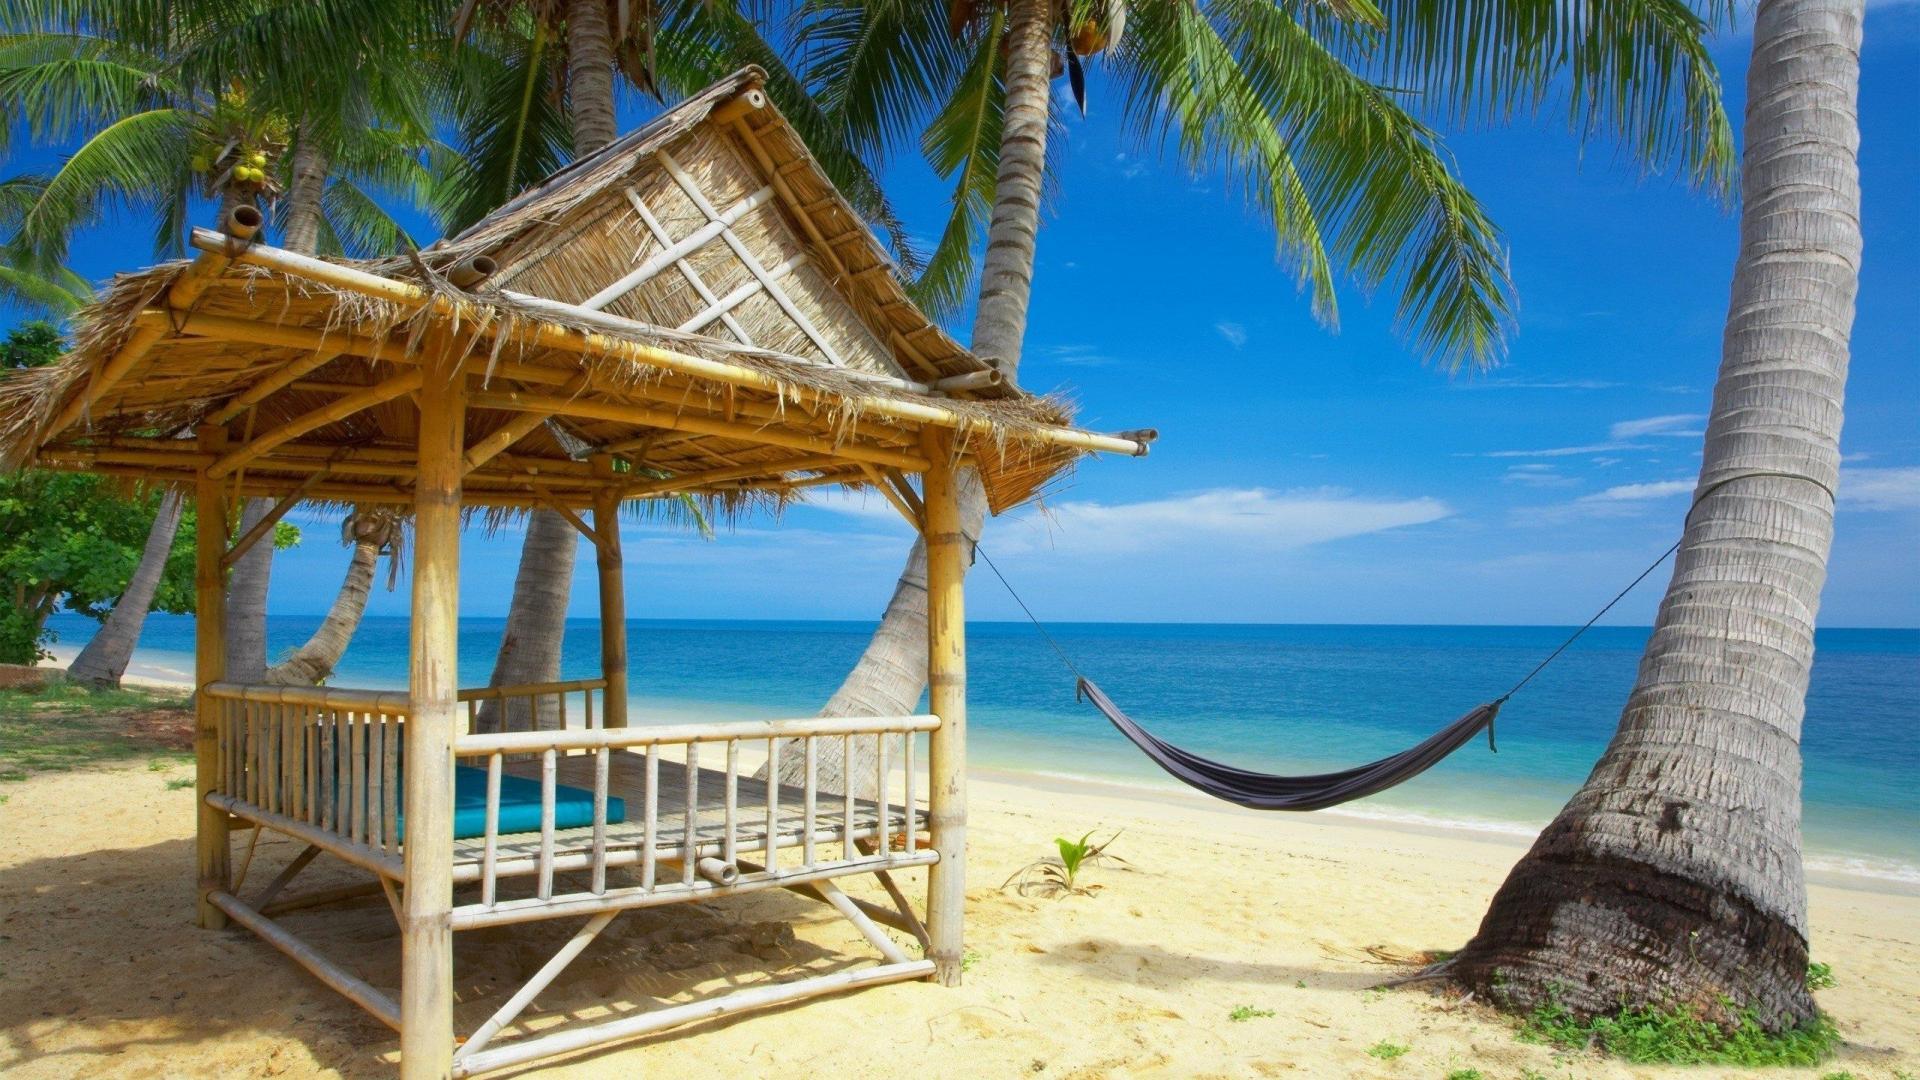 Wallpaper 2015 for Desktop Beautiful Beach Resort HD Wallpaper HD 1920x1080